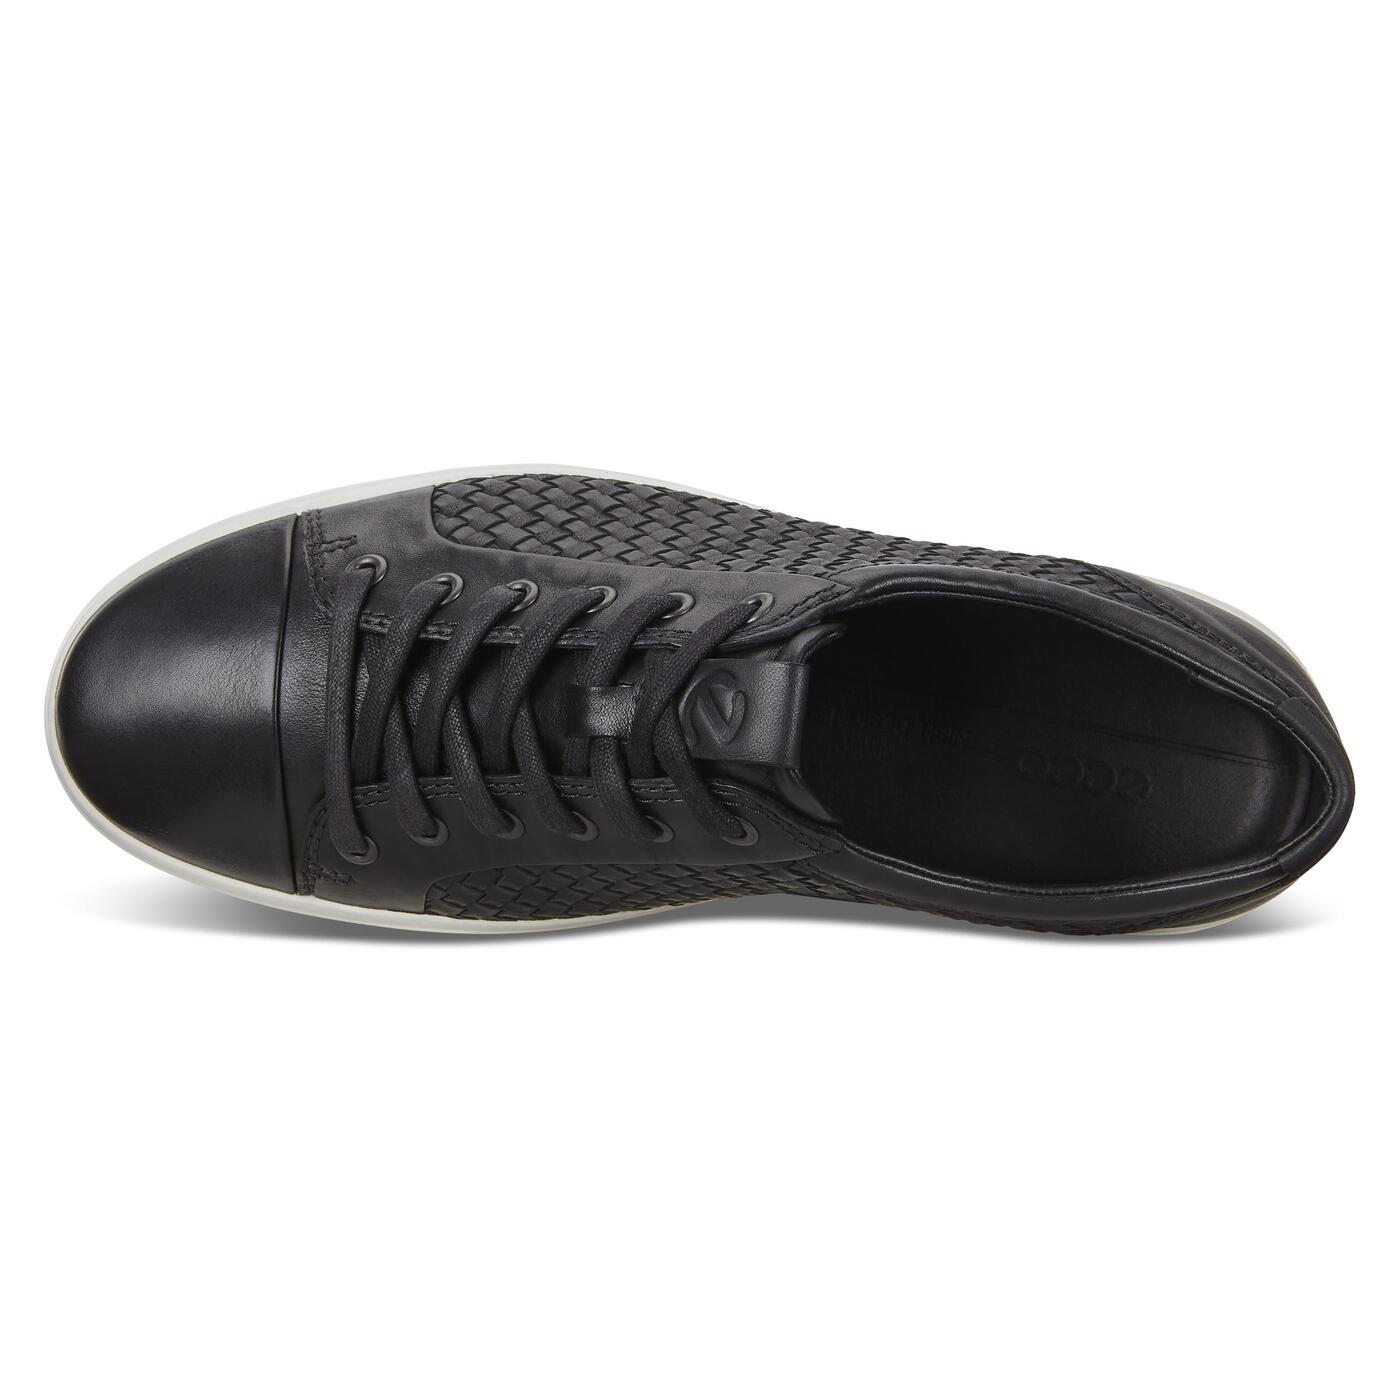 ECCO SOFT 7 Men's Sneaker